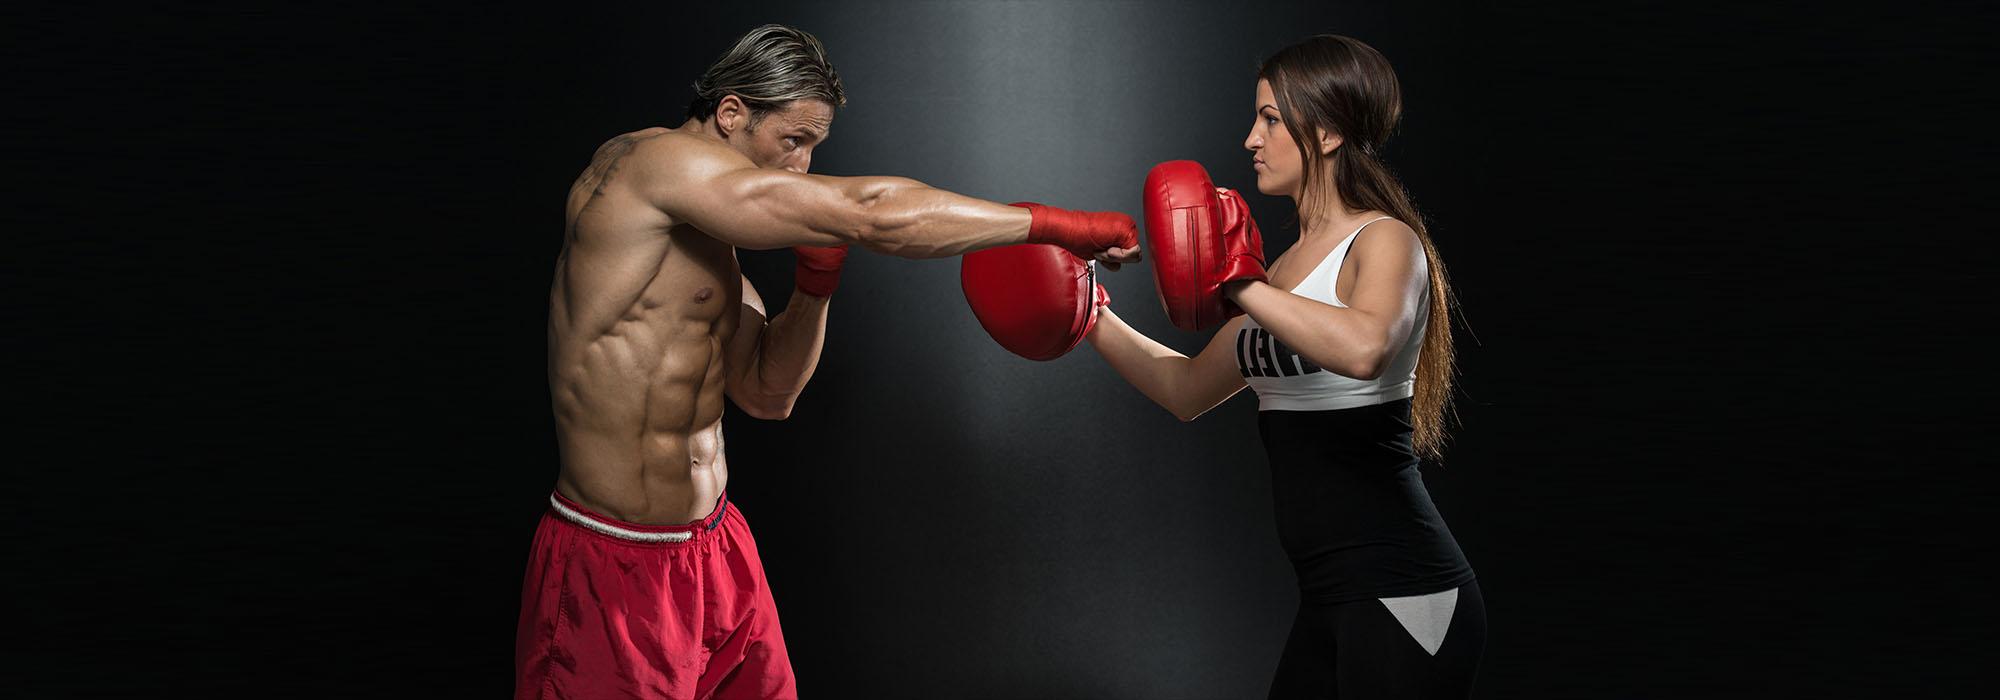 Kurs na trenera siłowni we Wrocławiu